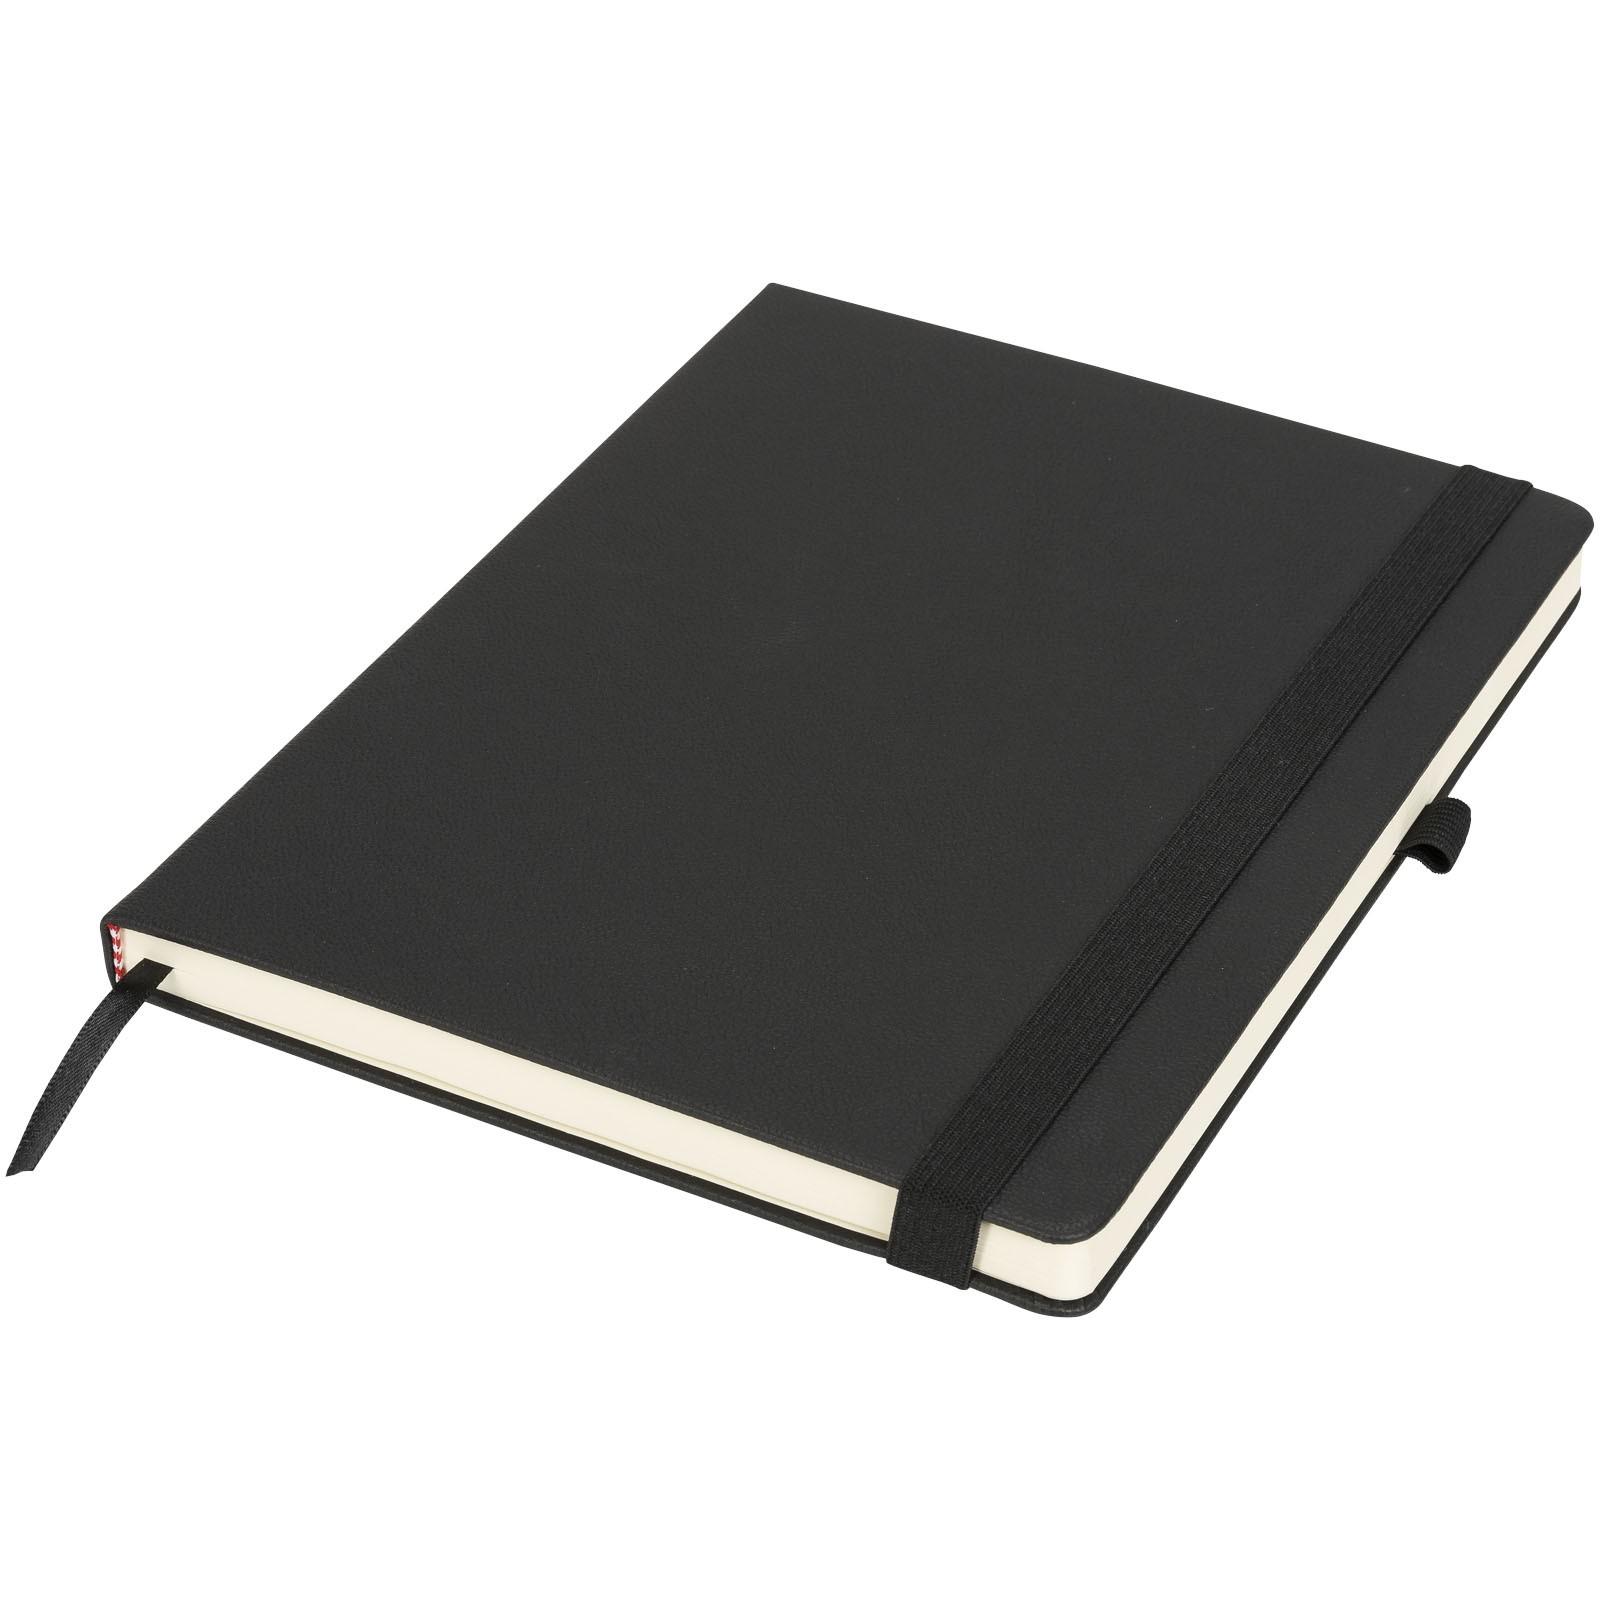 Rivista large notebook - Solid black